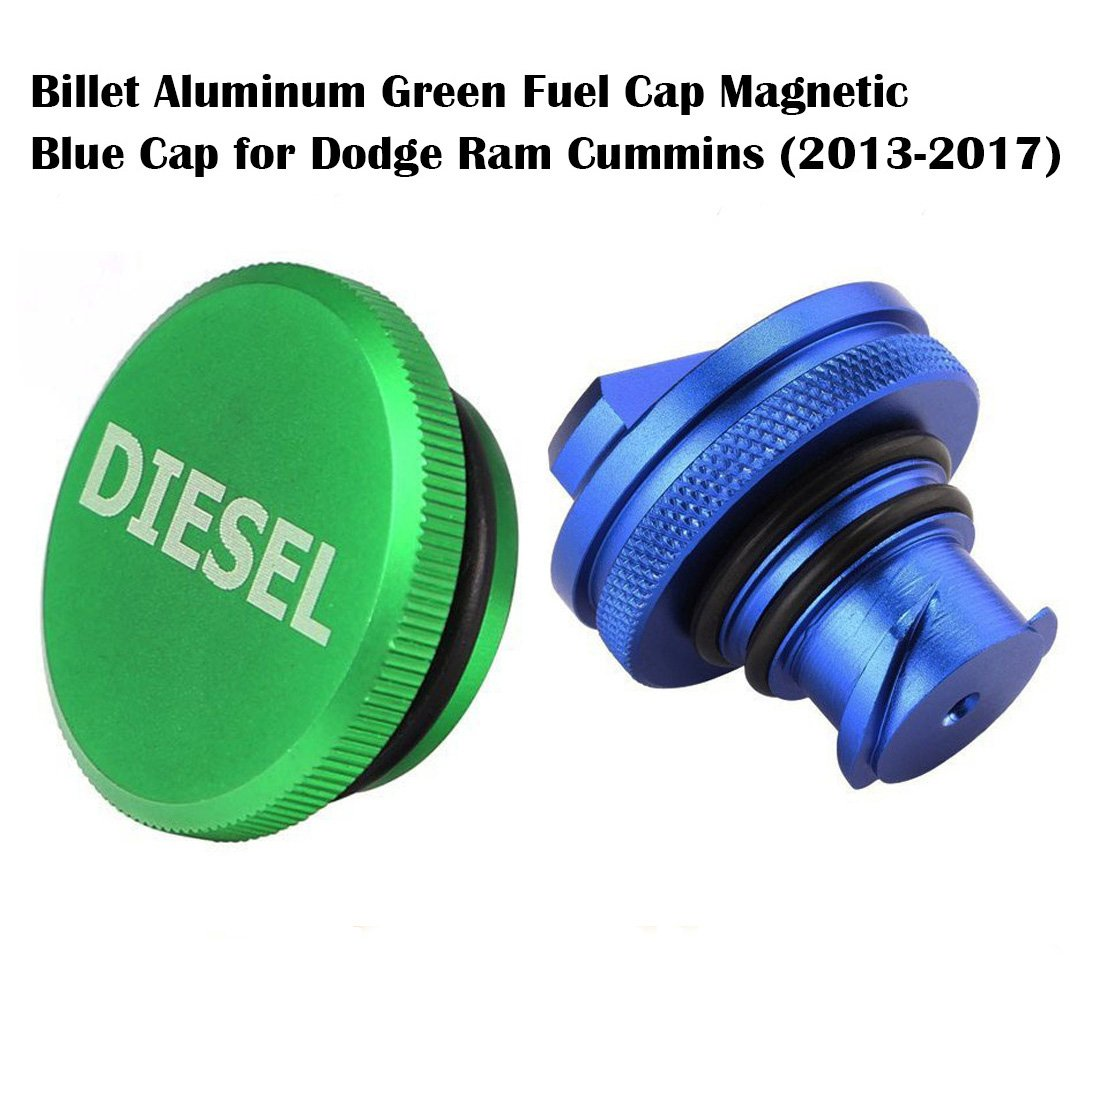 2013-2017 Dodge Ram Diesel Magnetic Billet Aluminum Fuel Cap and Blue DEF Cap Combo WHDZ